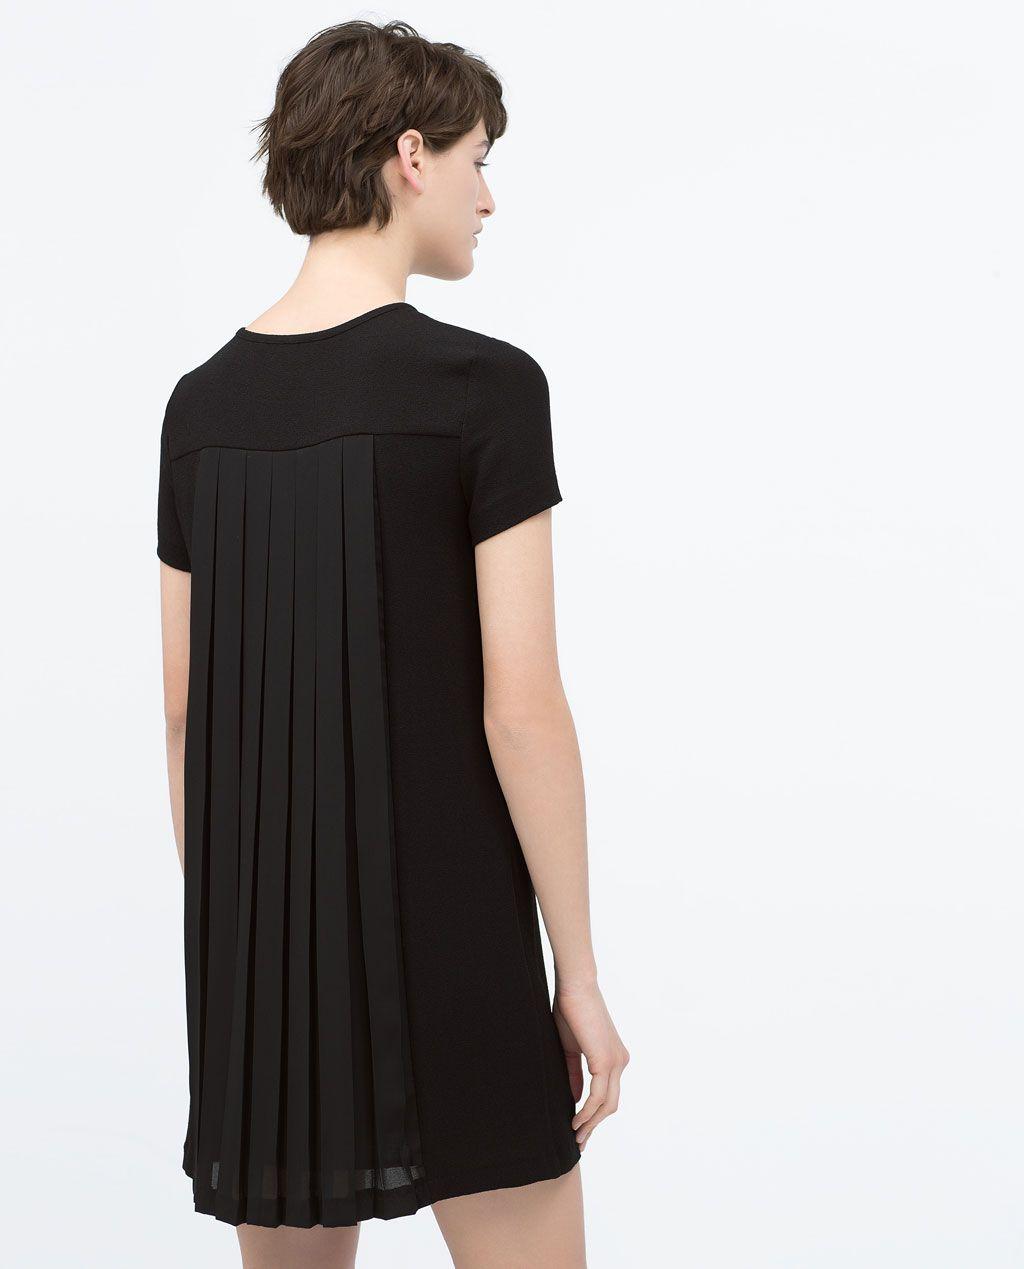 ZARA COLLECTION SS15 BACK PLEATED DRESS | Robe plissée